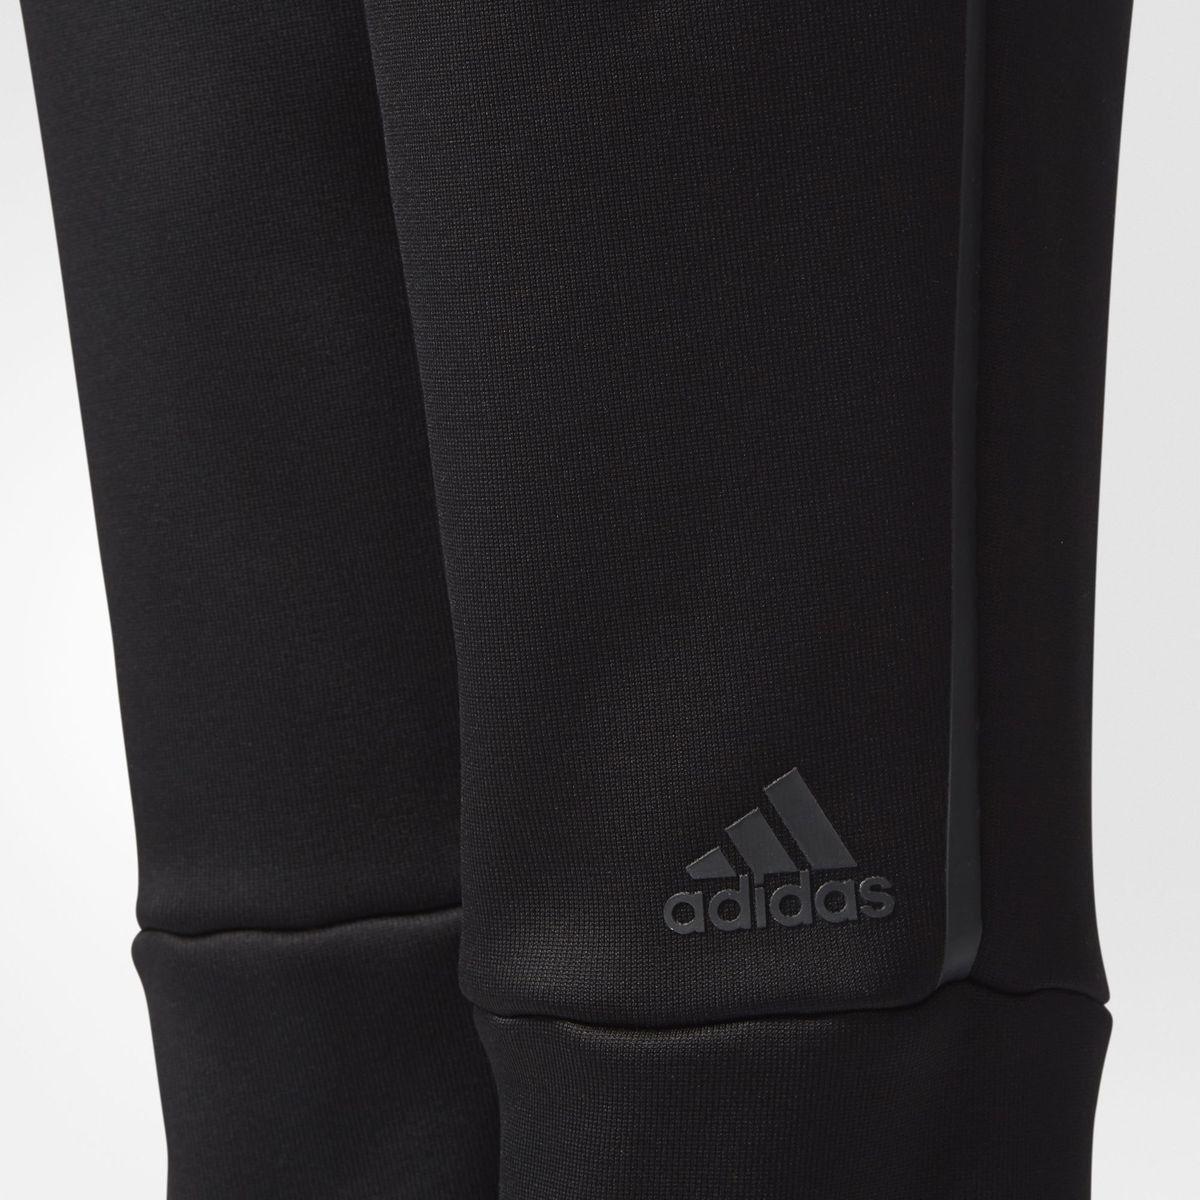 Pantalon Adidas Z.n.e. Climaheat Taille : 1112 ans;1314